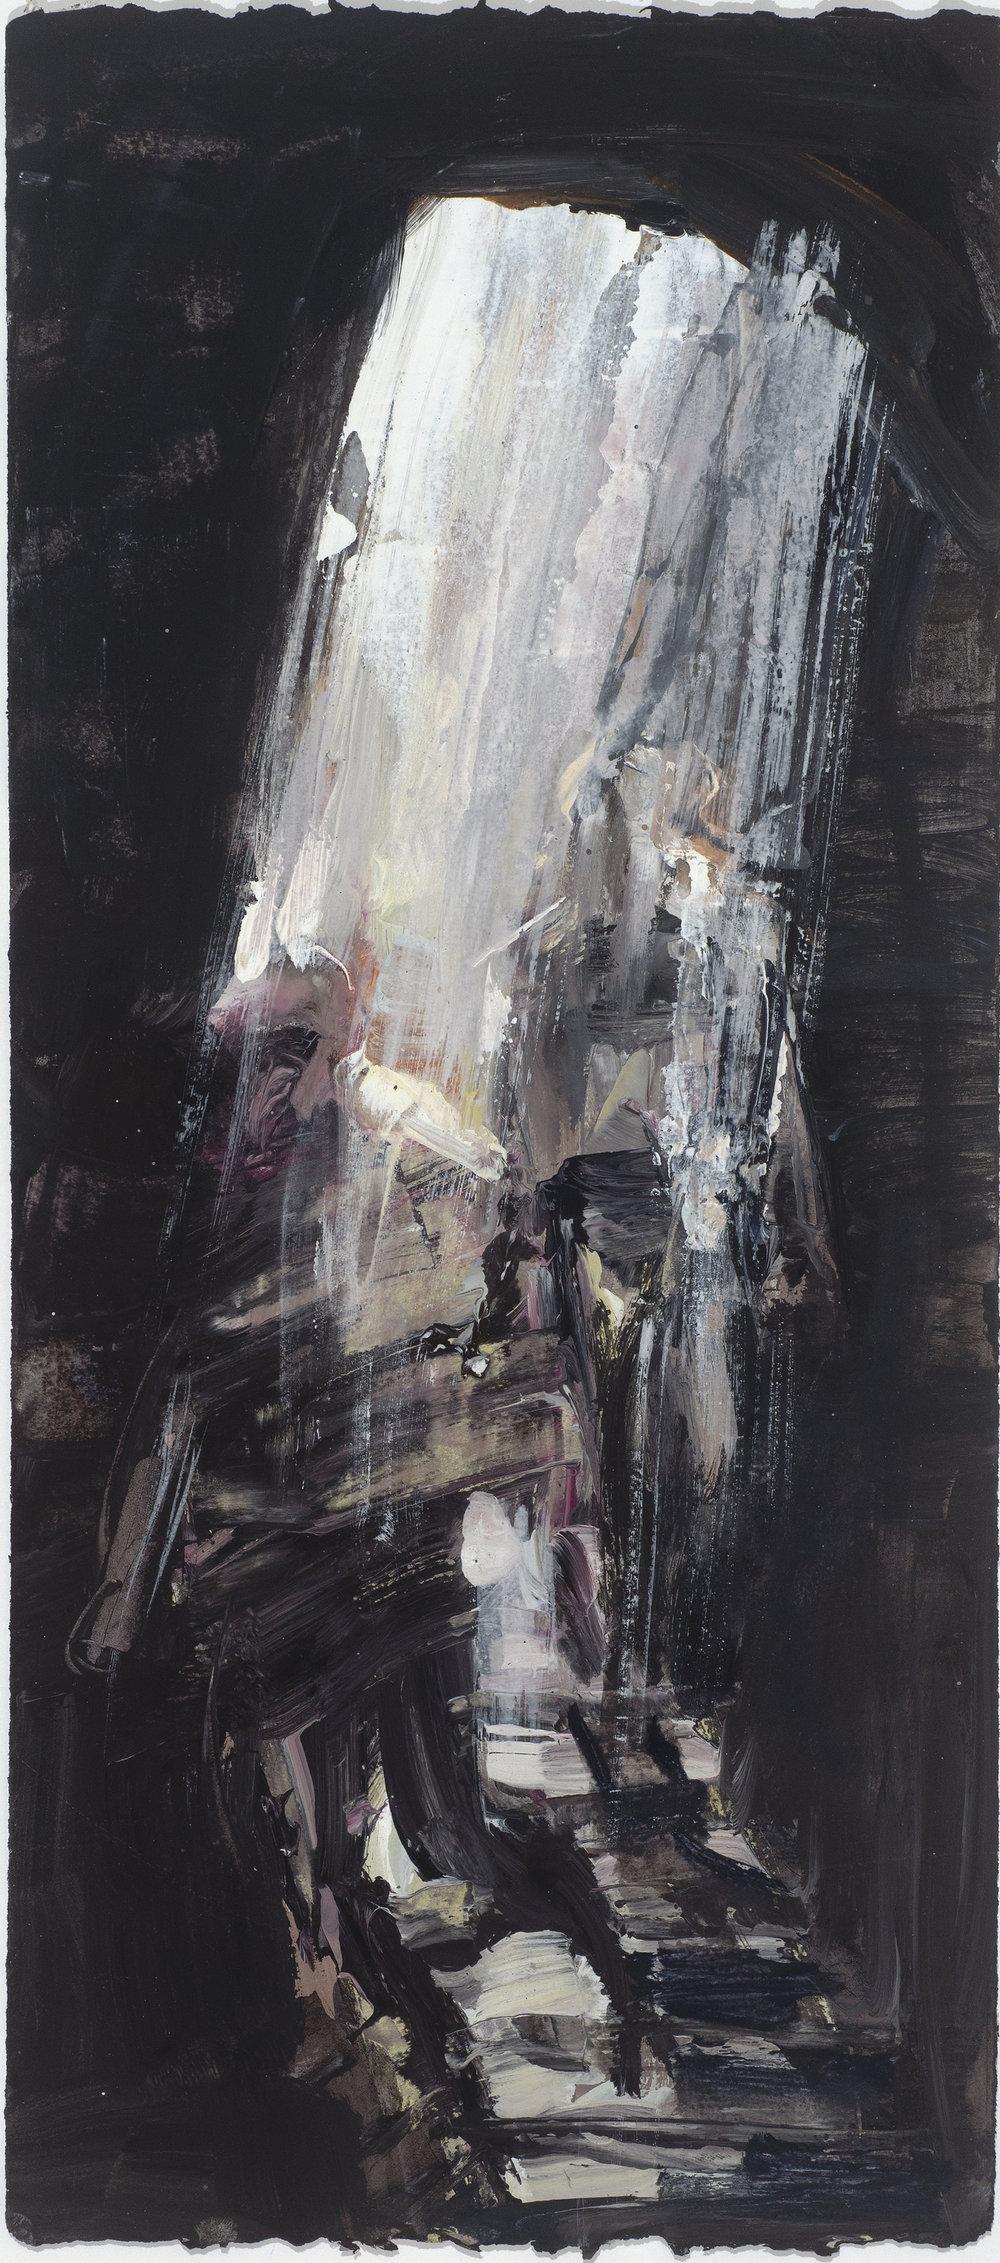 Tall cave study 10/16  高峭的洞穴考察10/16   Euan Macleod , 2016  Acrylic on paper, 57 x 25 cm, HKD 11,300 framed